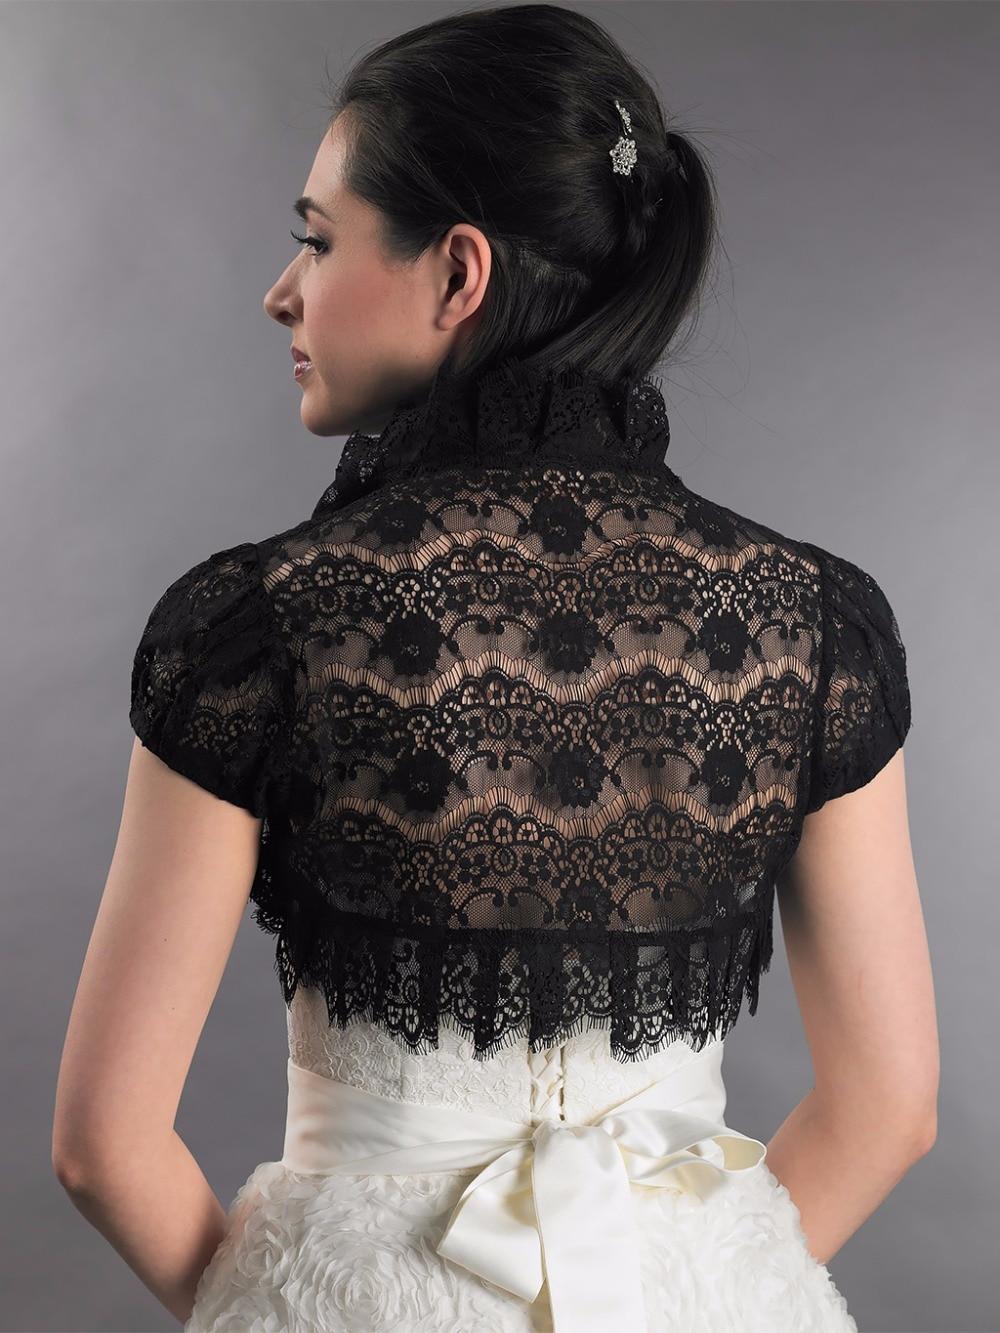 Aliexpress.com : Buy Lace Bolero Jackets for Evening Dresses Black ...